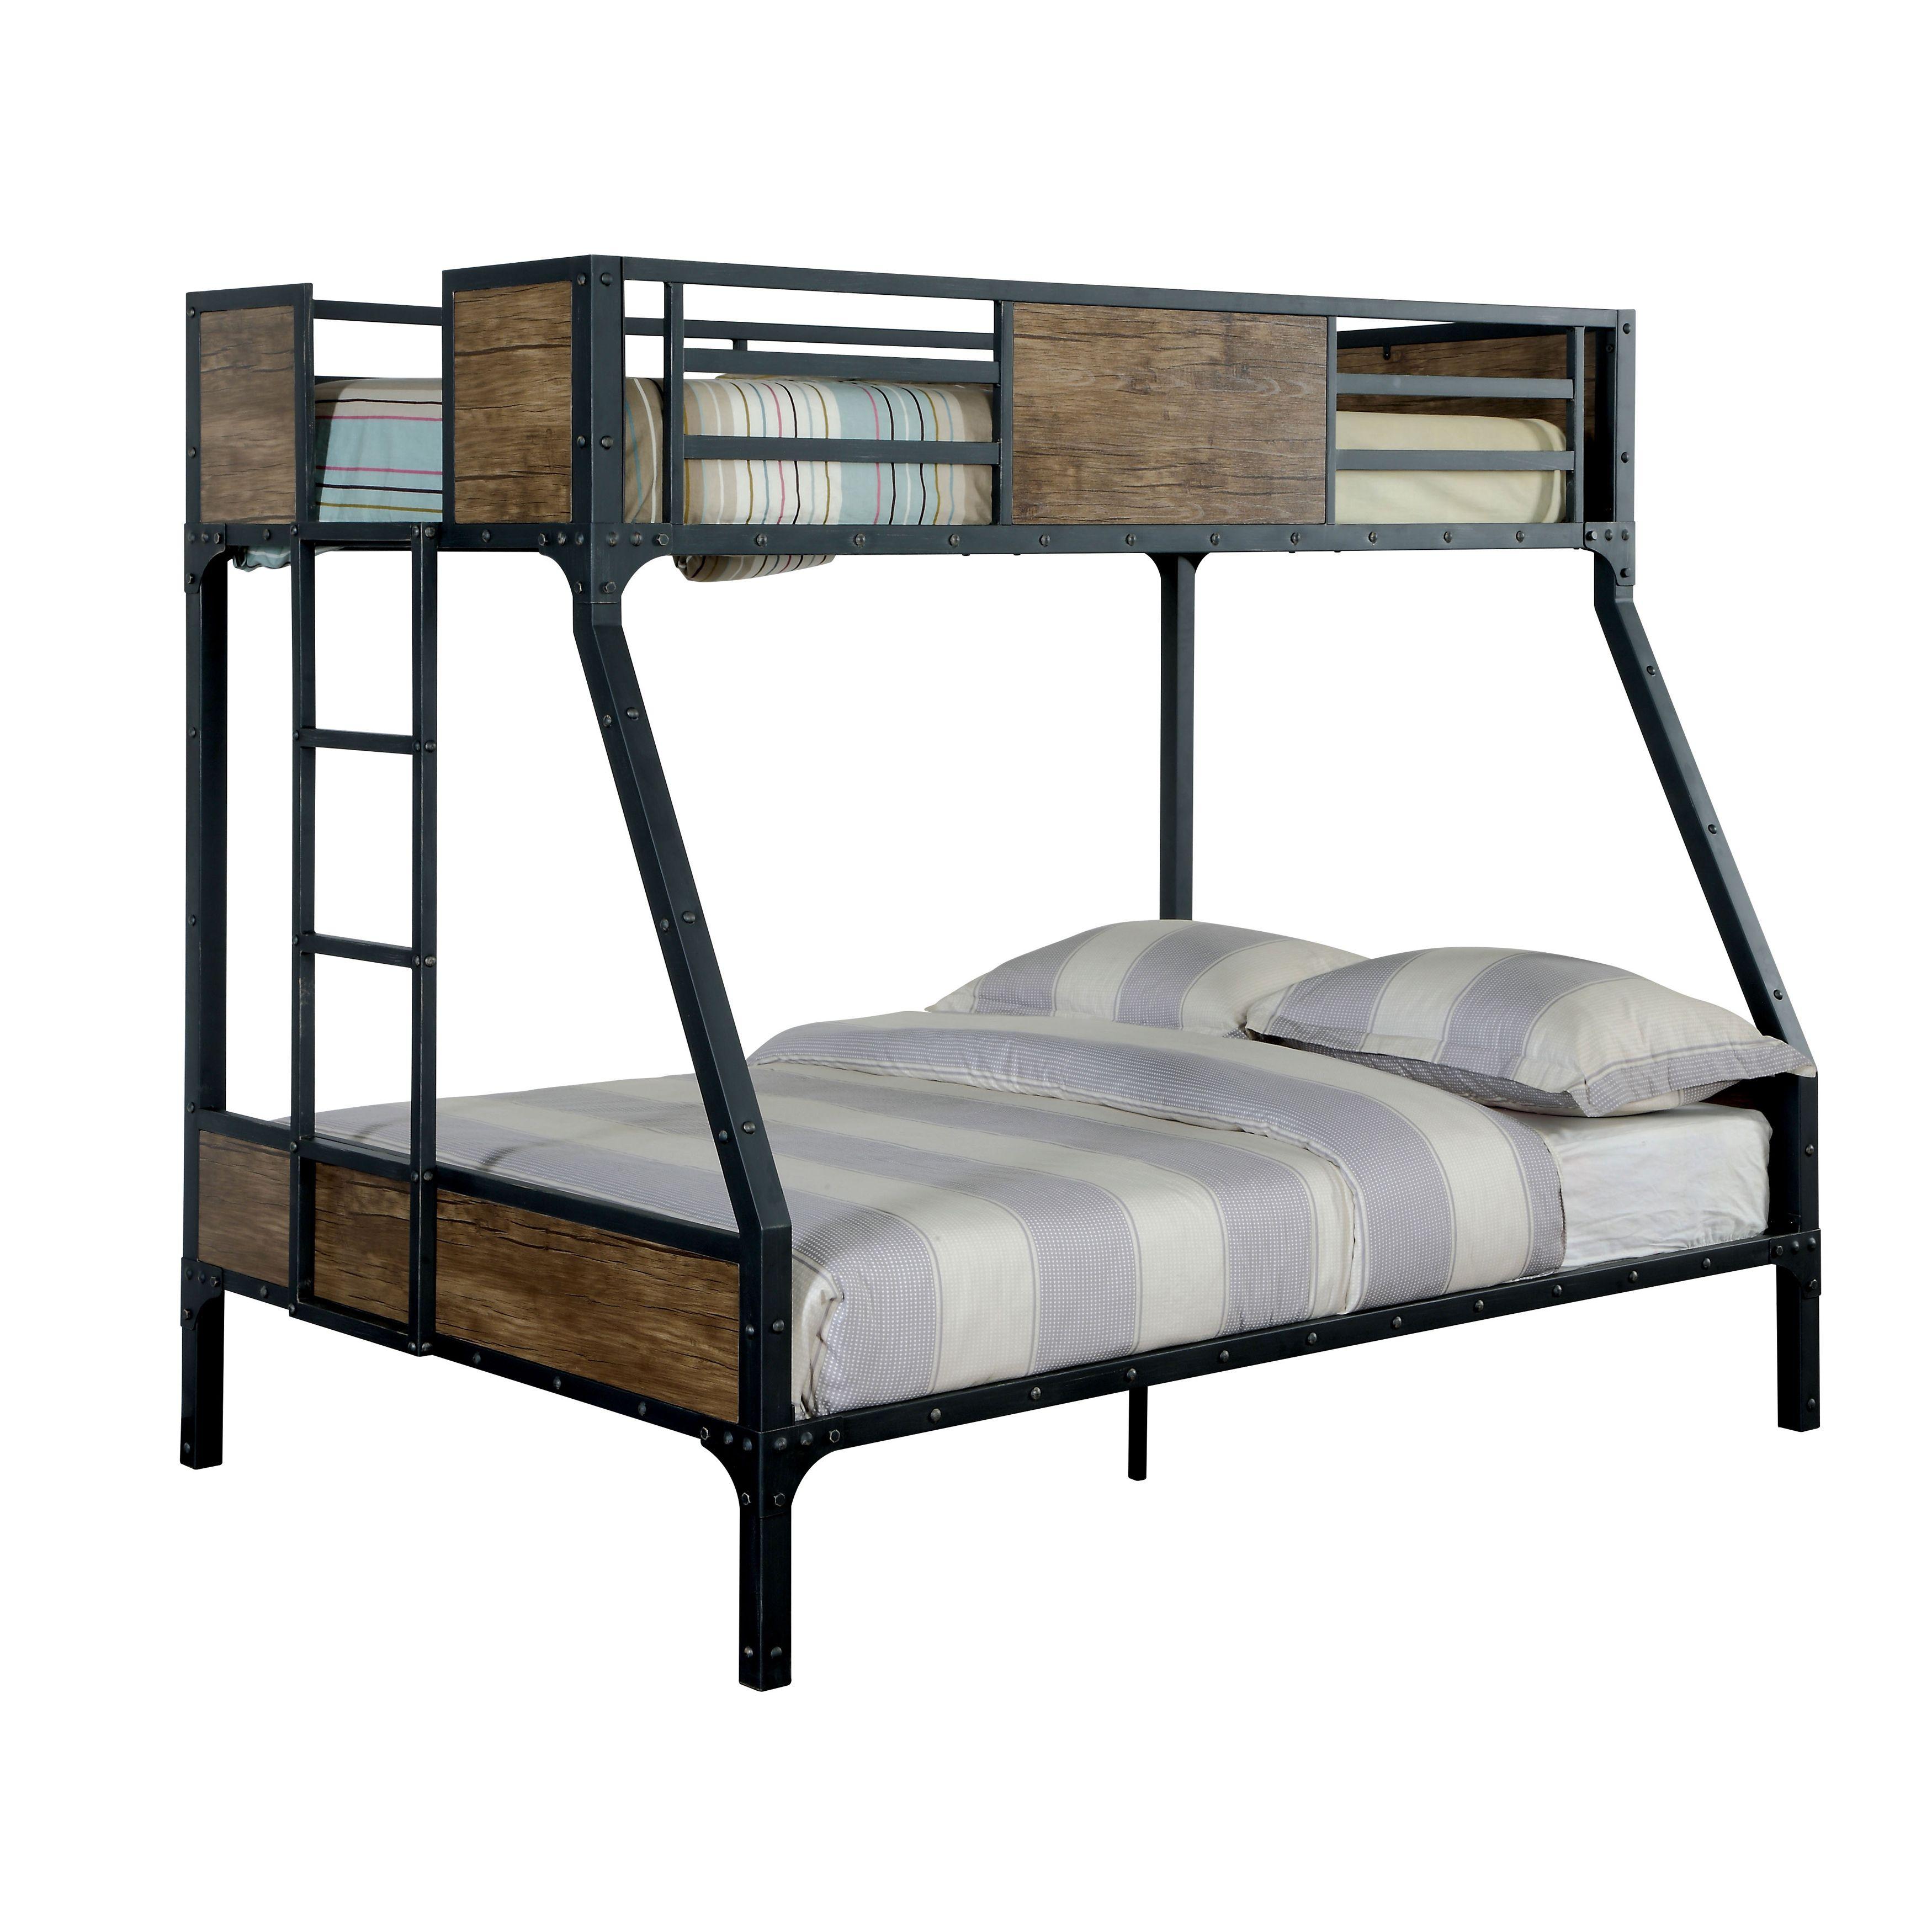 Furniture of America Markain Industrial Metal Bunk Bed